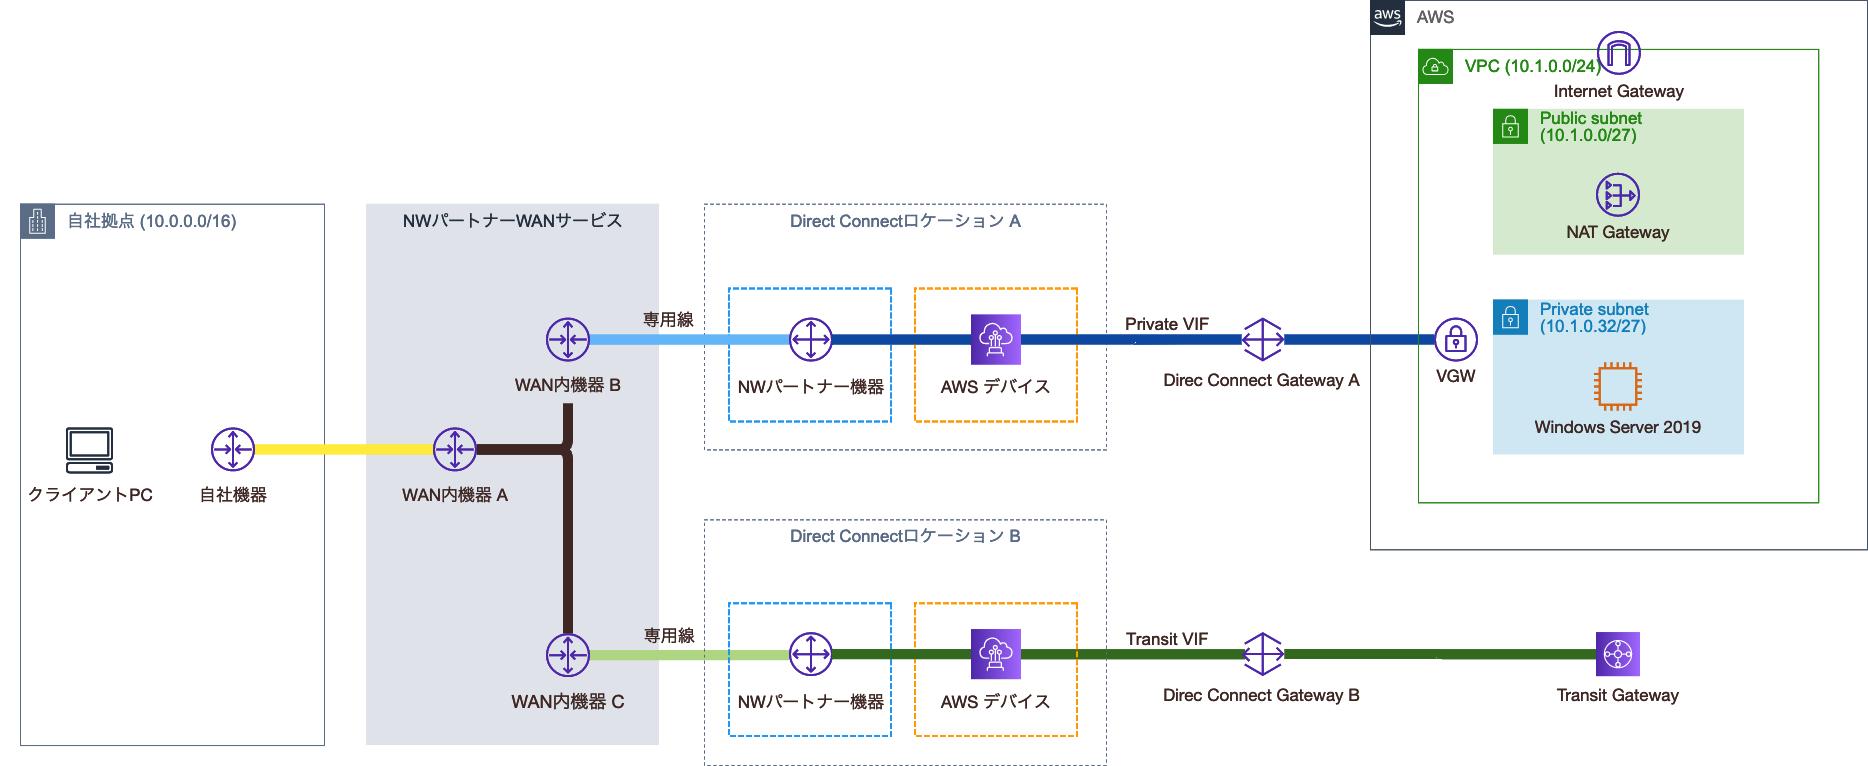 Direct Connect GatewayとTransit Gateway関連付け後の構成図